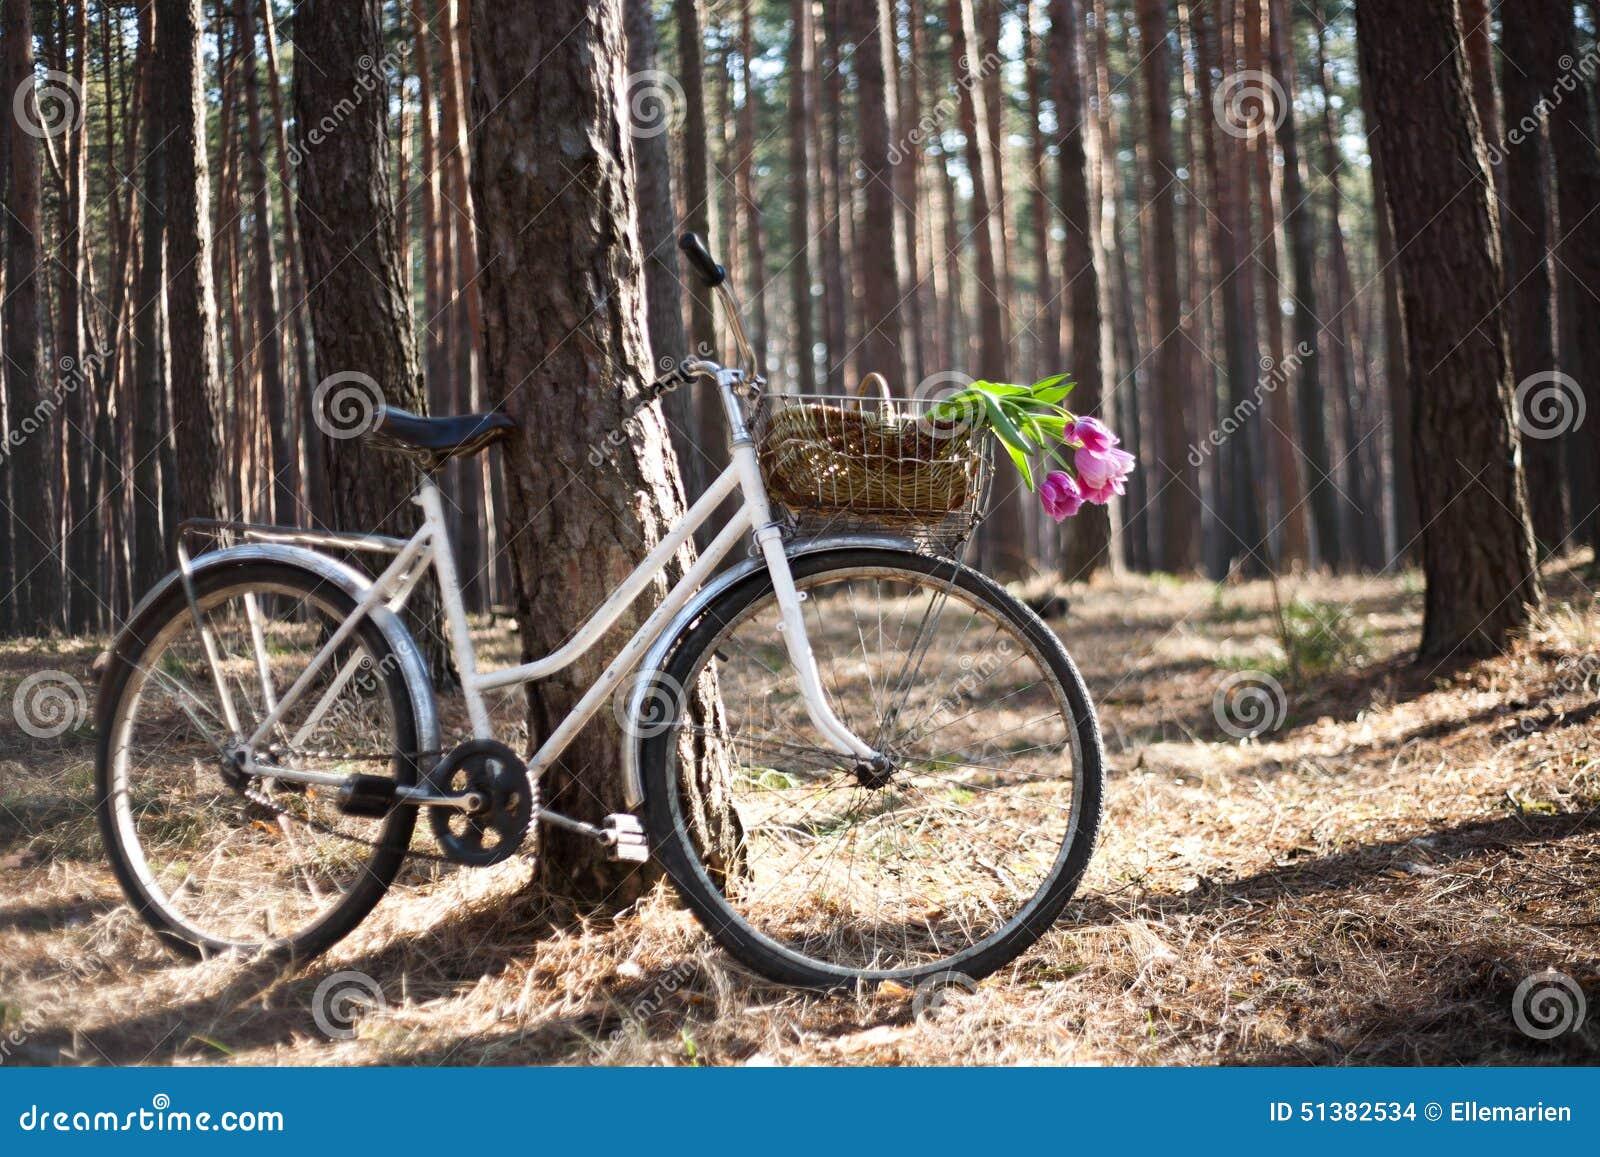 altes fahrrad mit blumen im korb das holz stockfoto. Black Bedroom Furniture Sets. Home Design Ideas